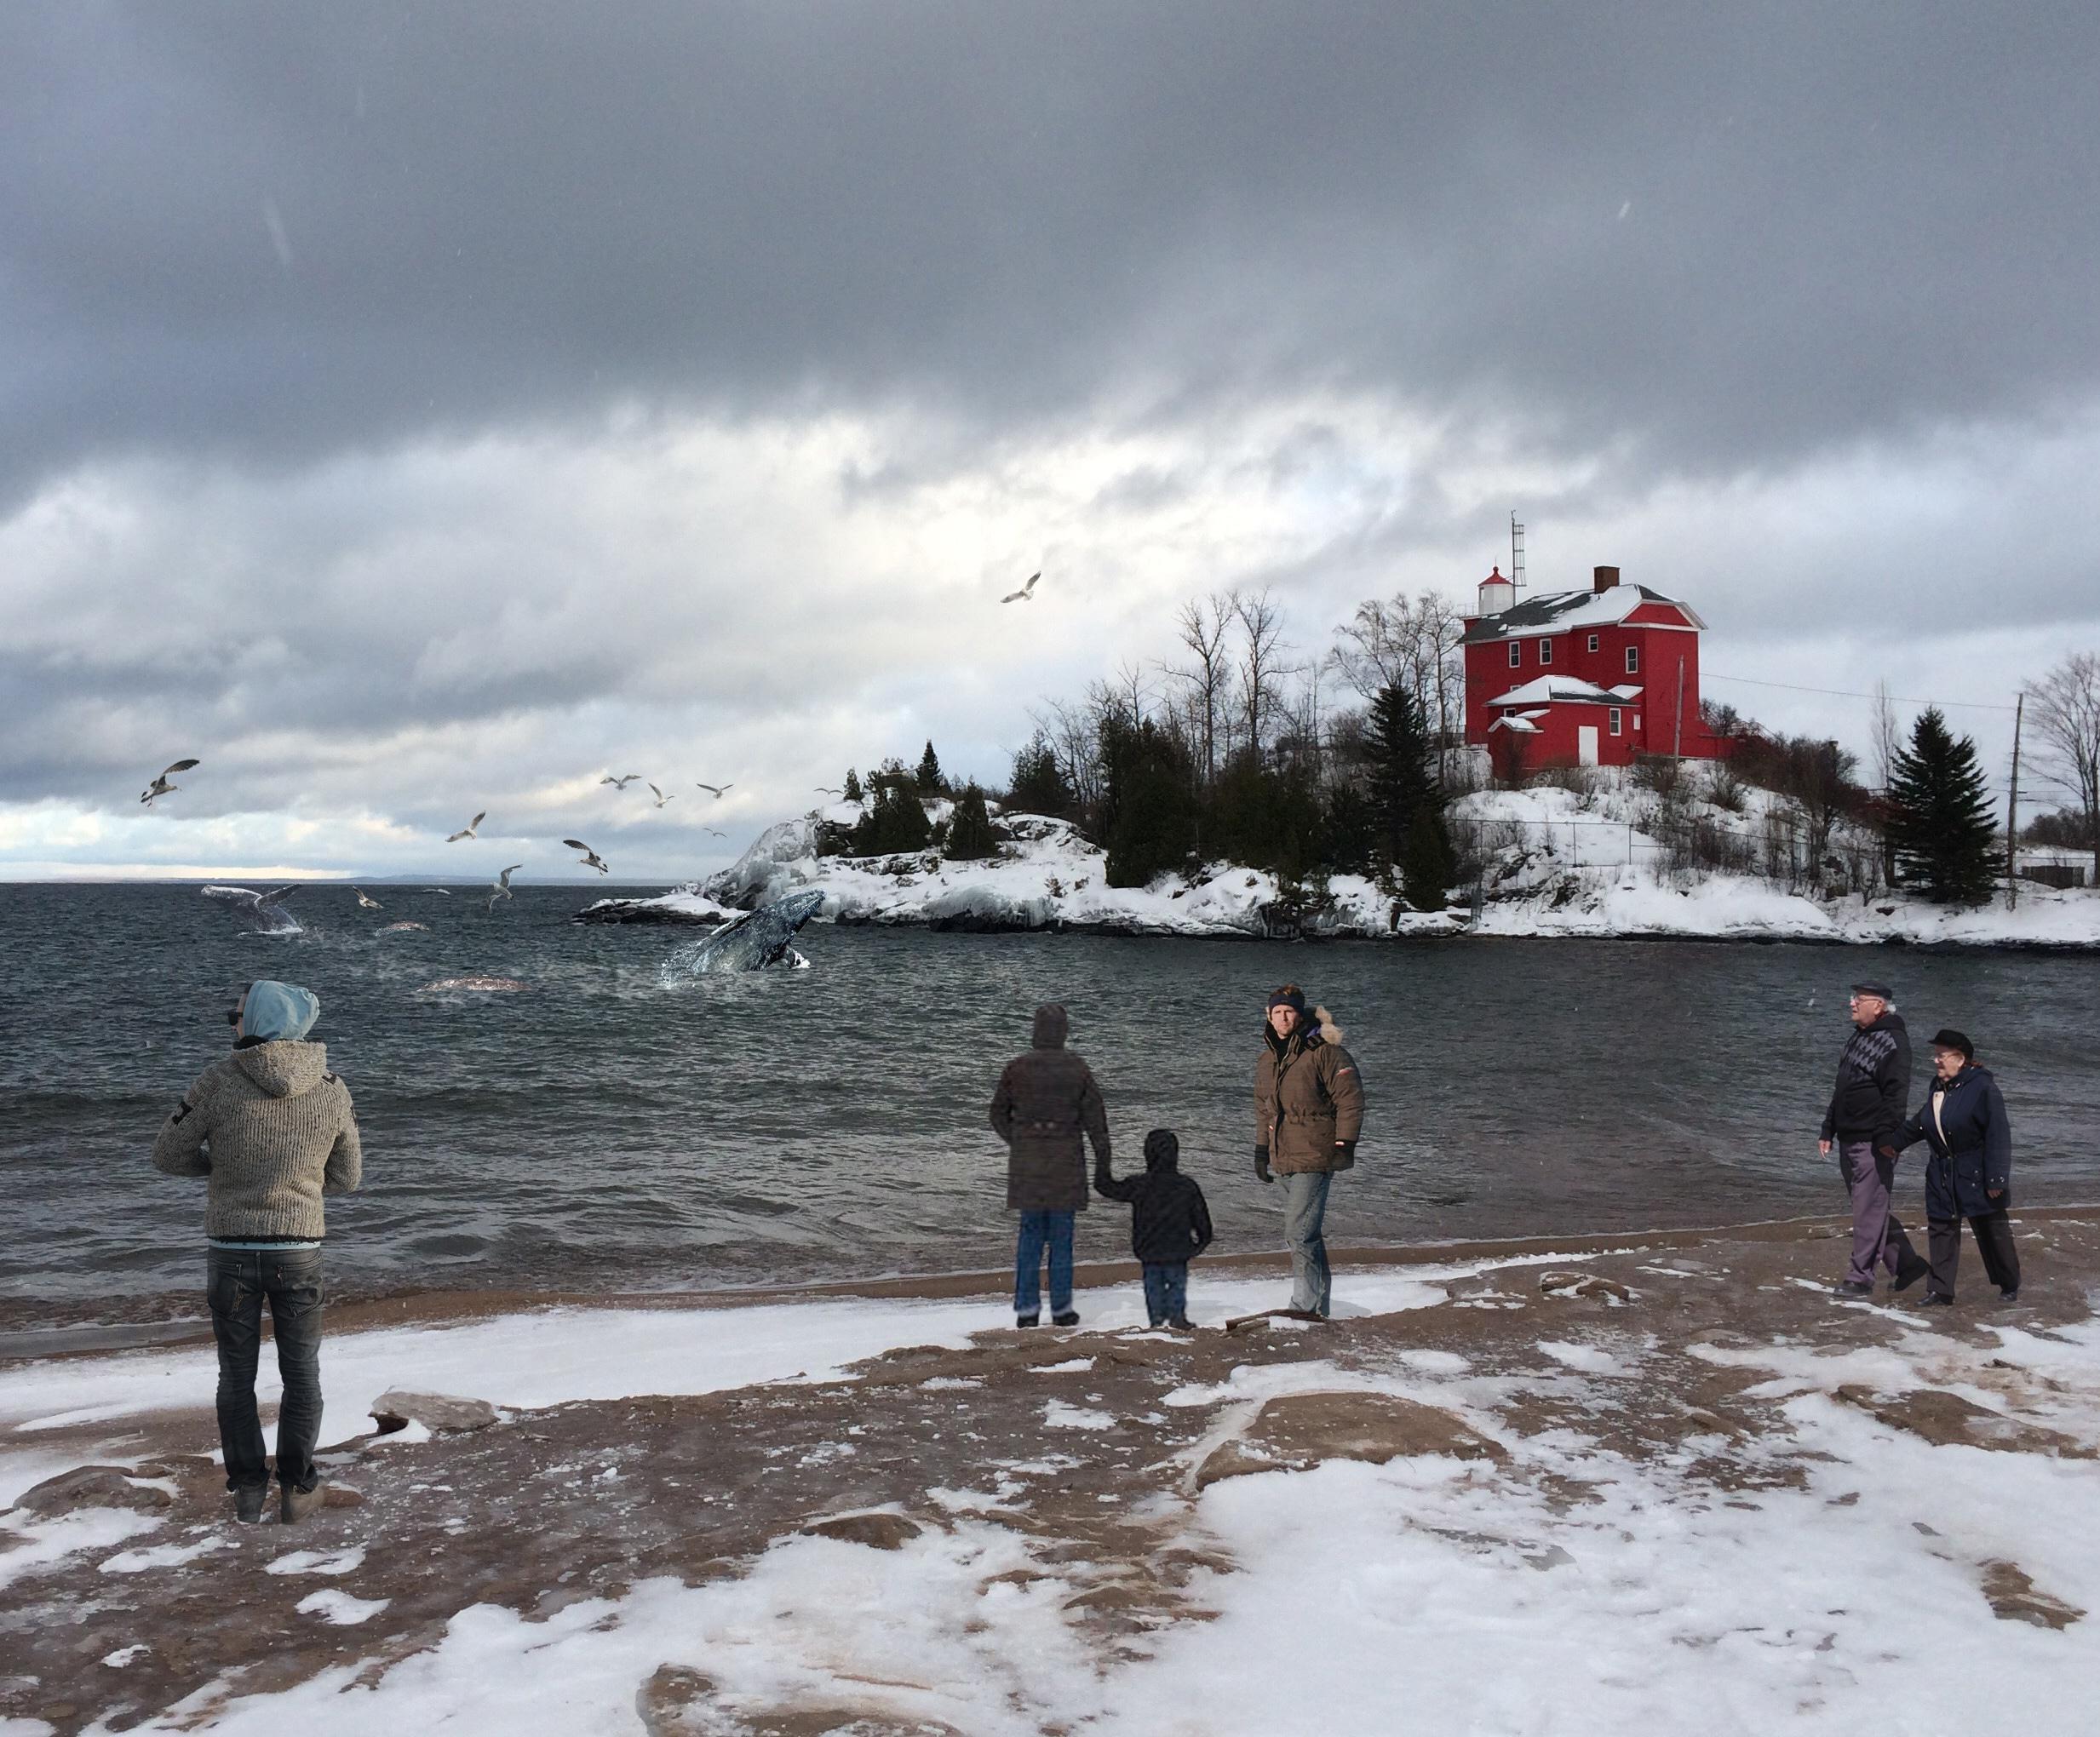 onlookers watch whale offshore near marquette mi